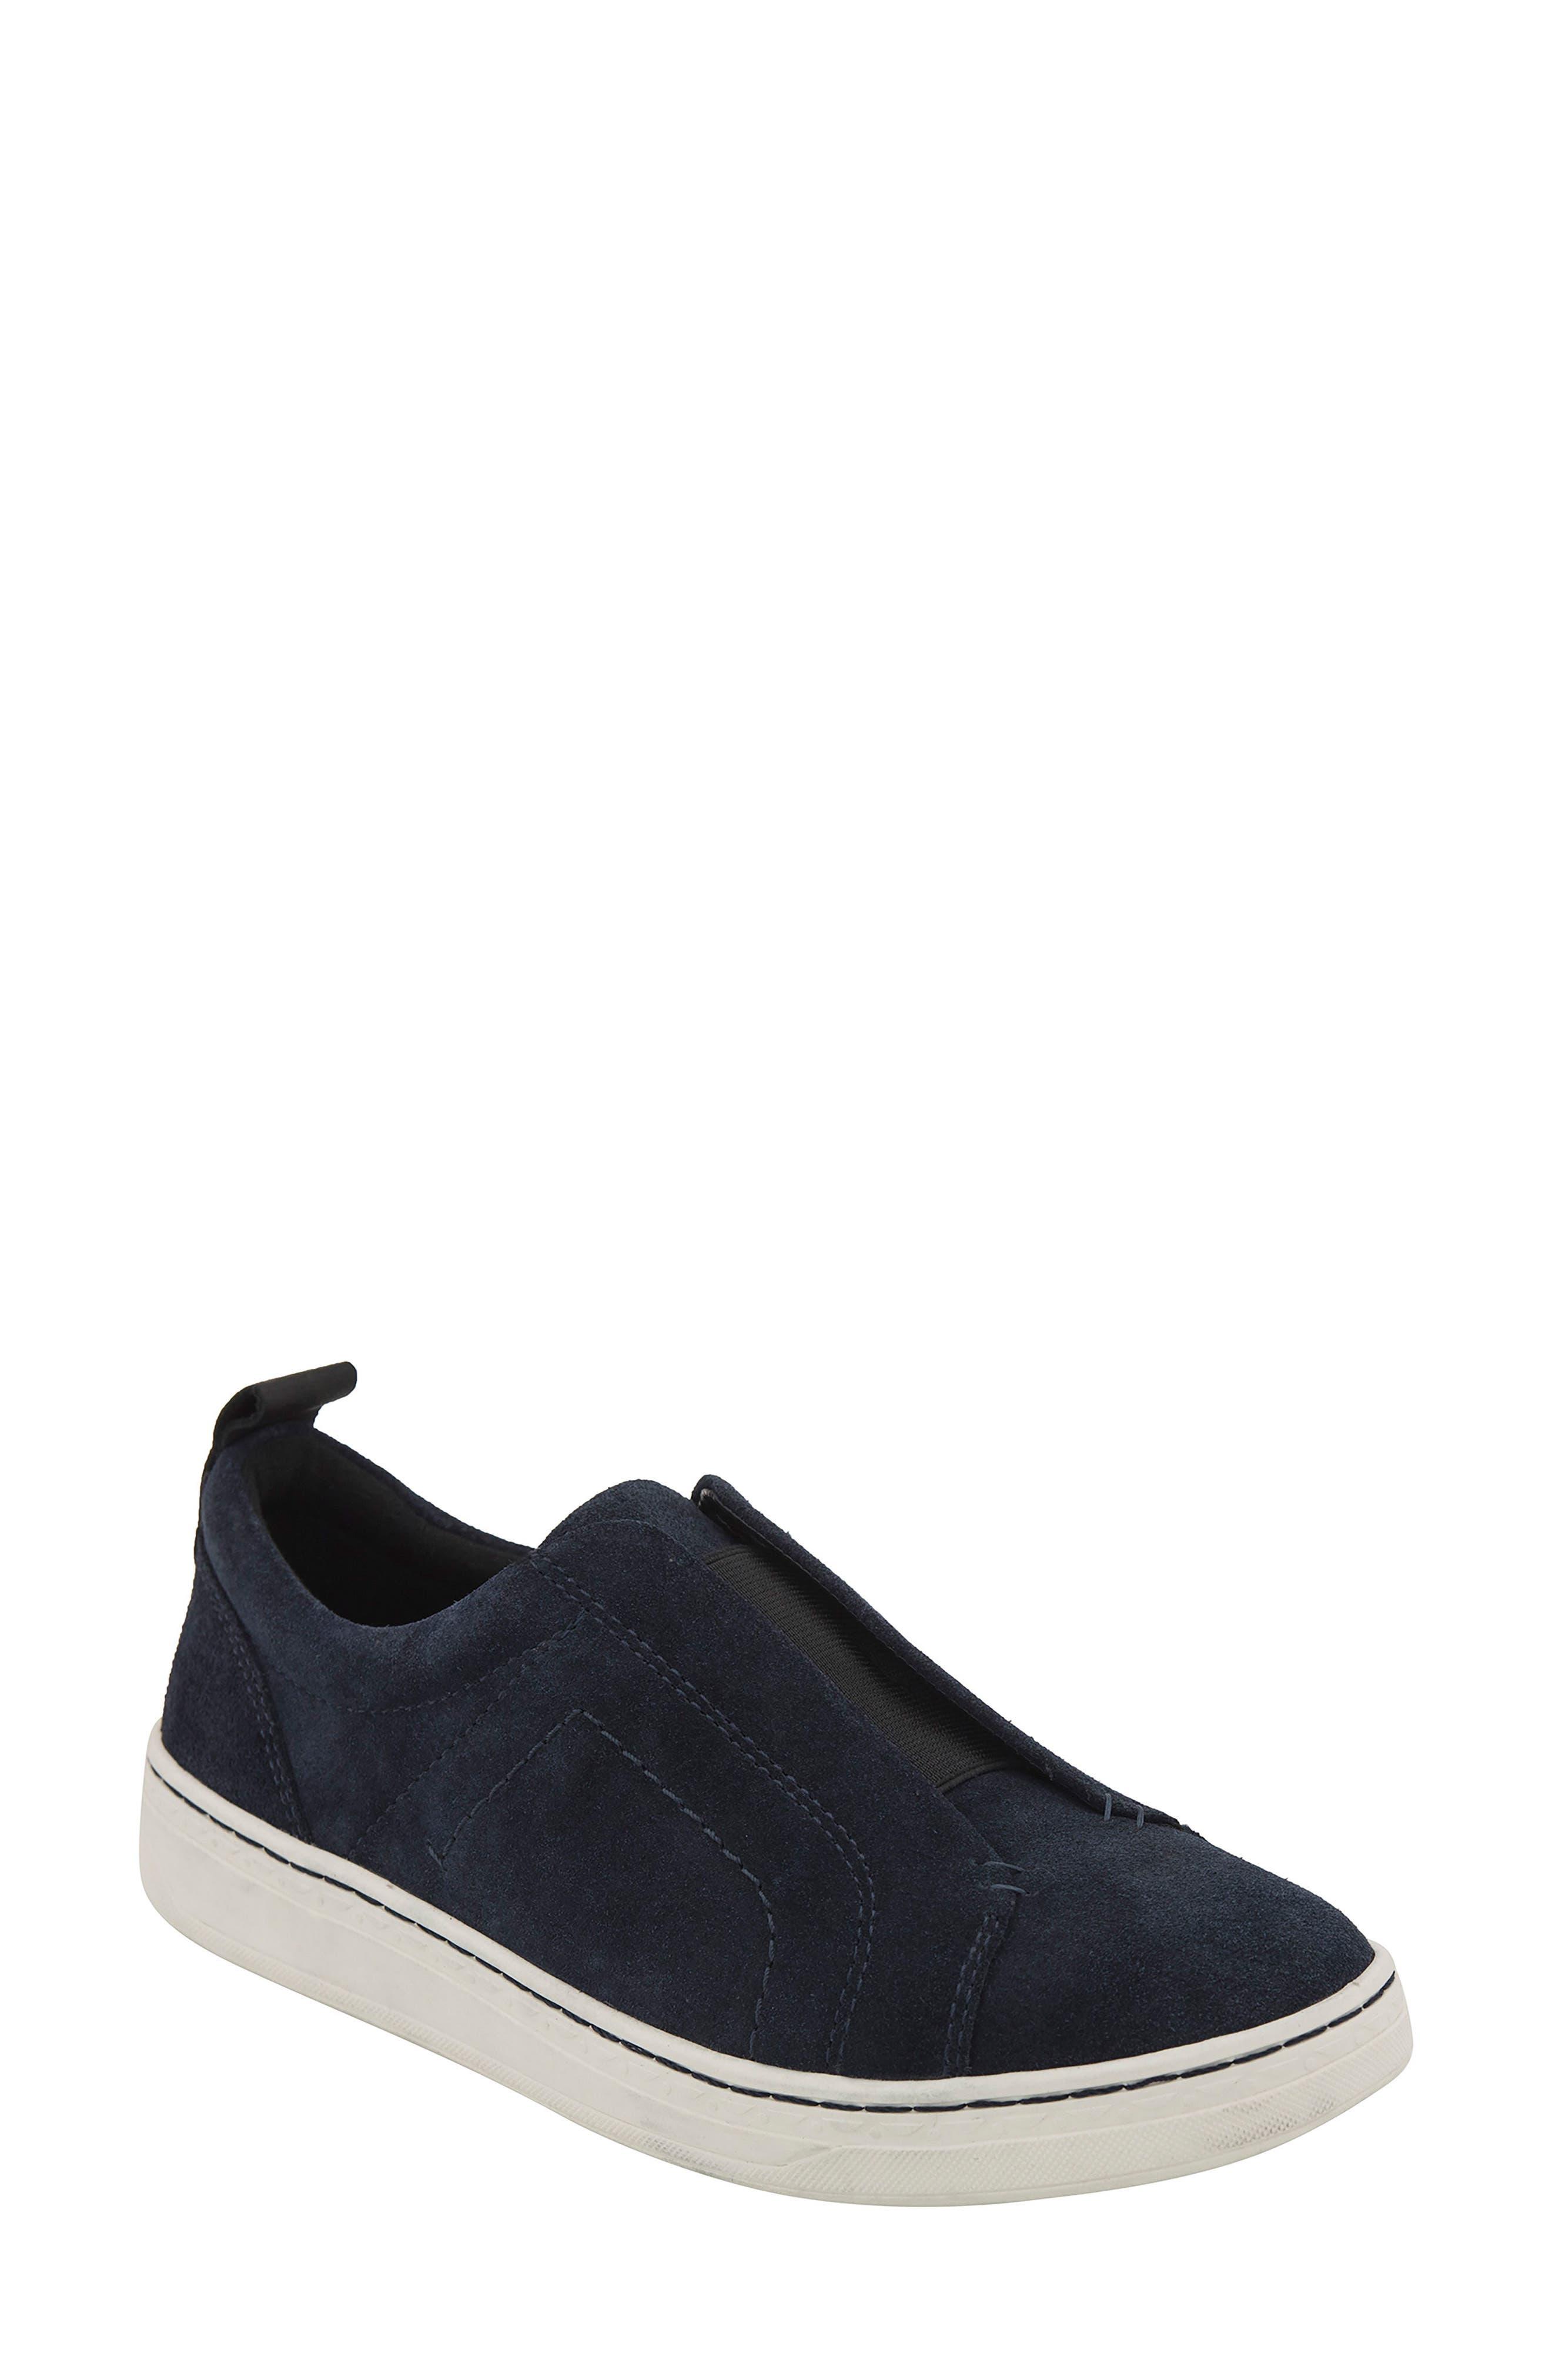 EARTH<SUP>®</SUP> Zetta Slip-On Sneaker